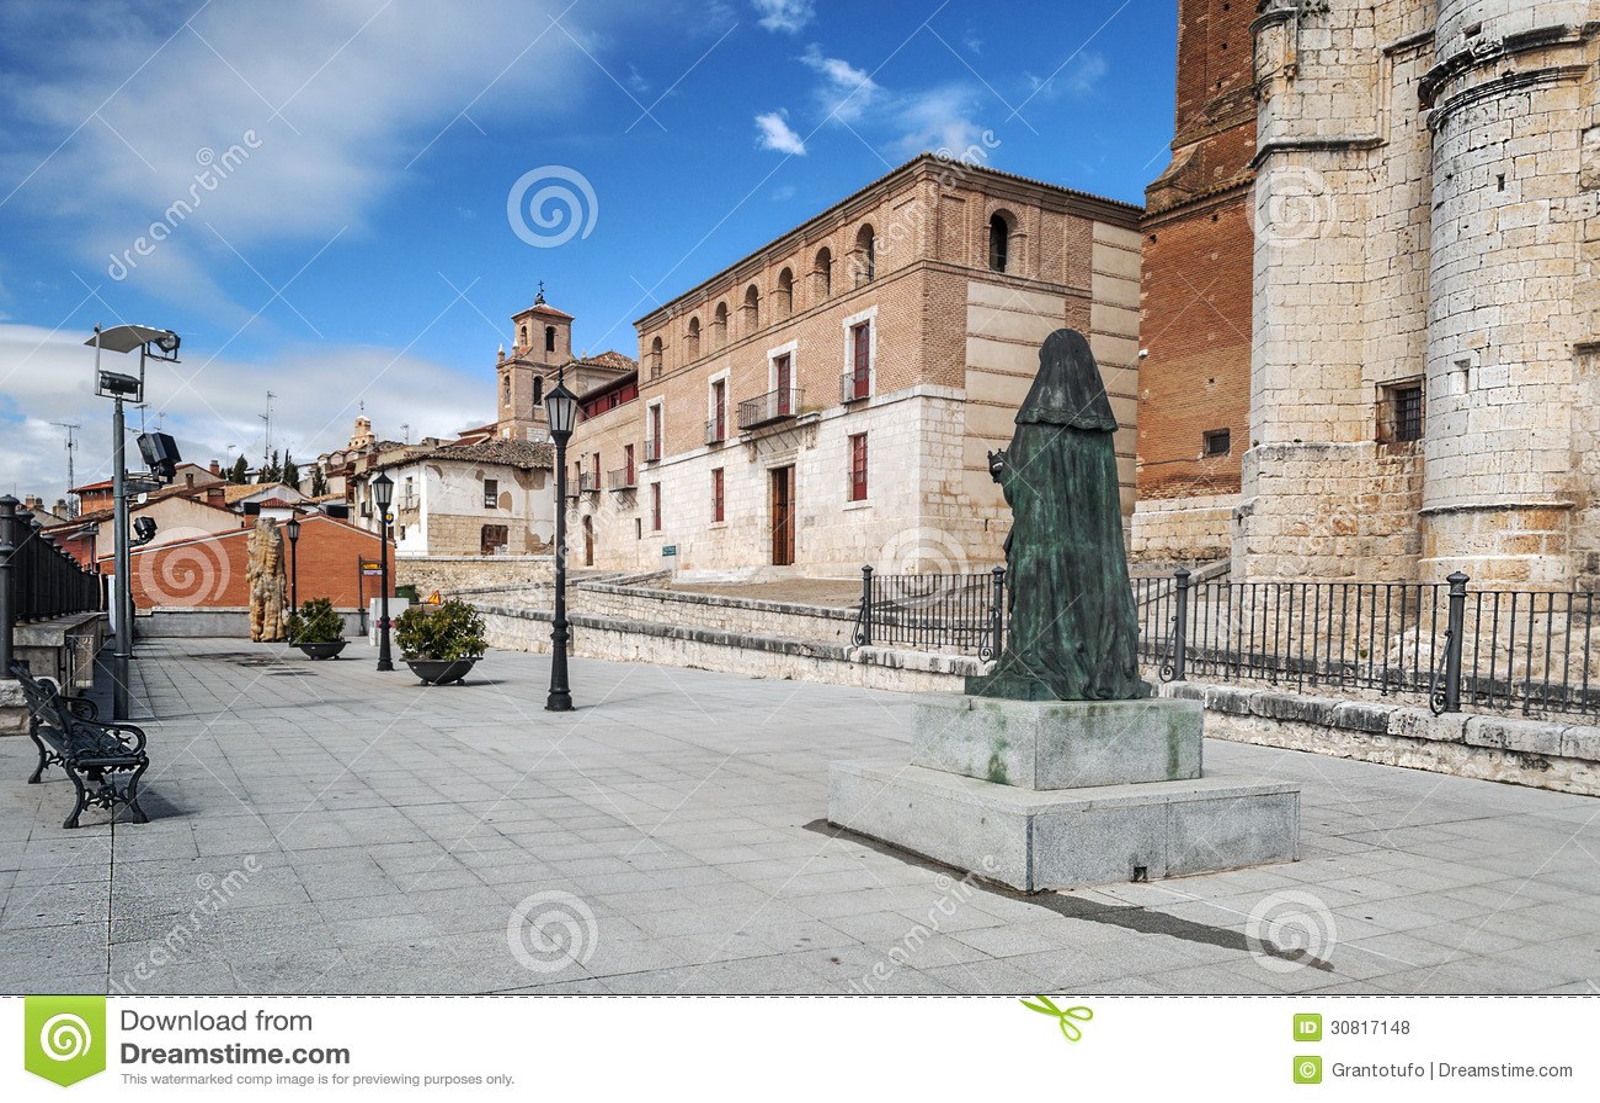 Podwórze Tordesillas